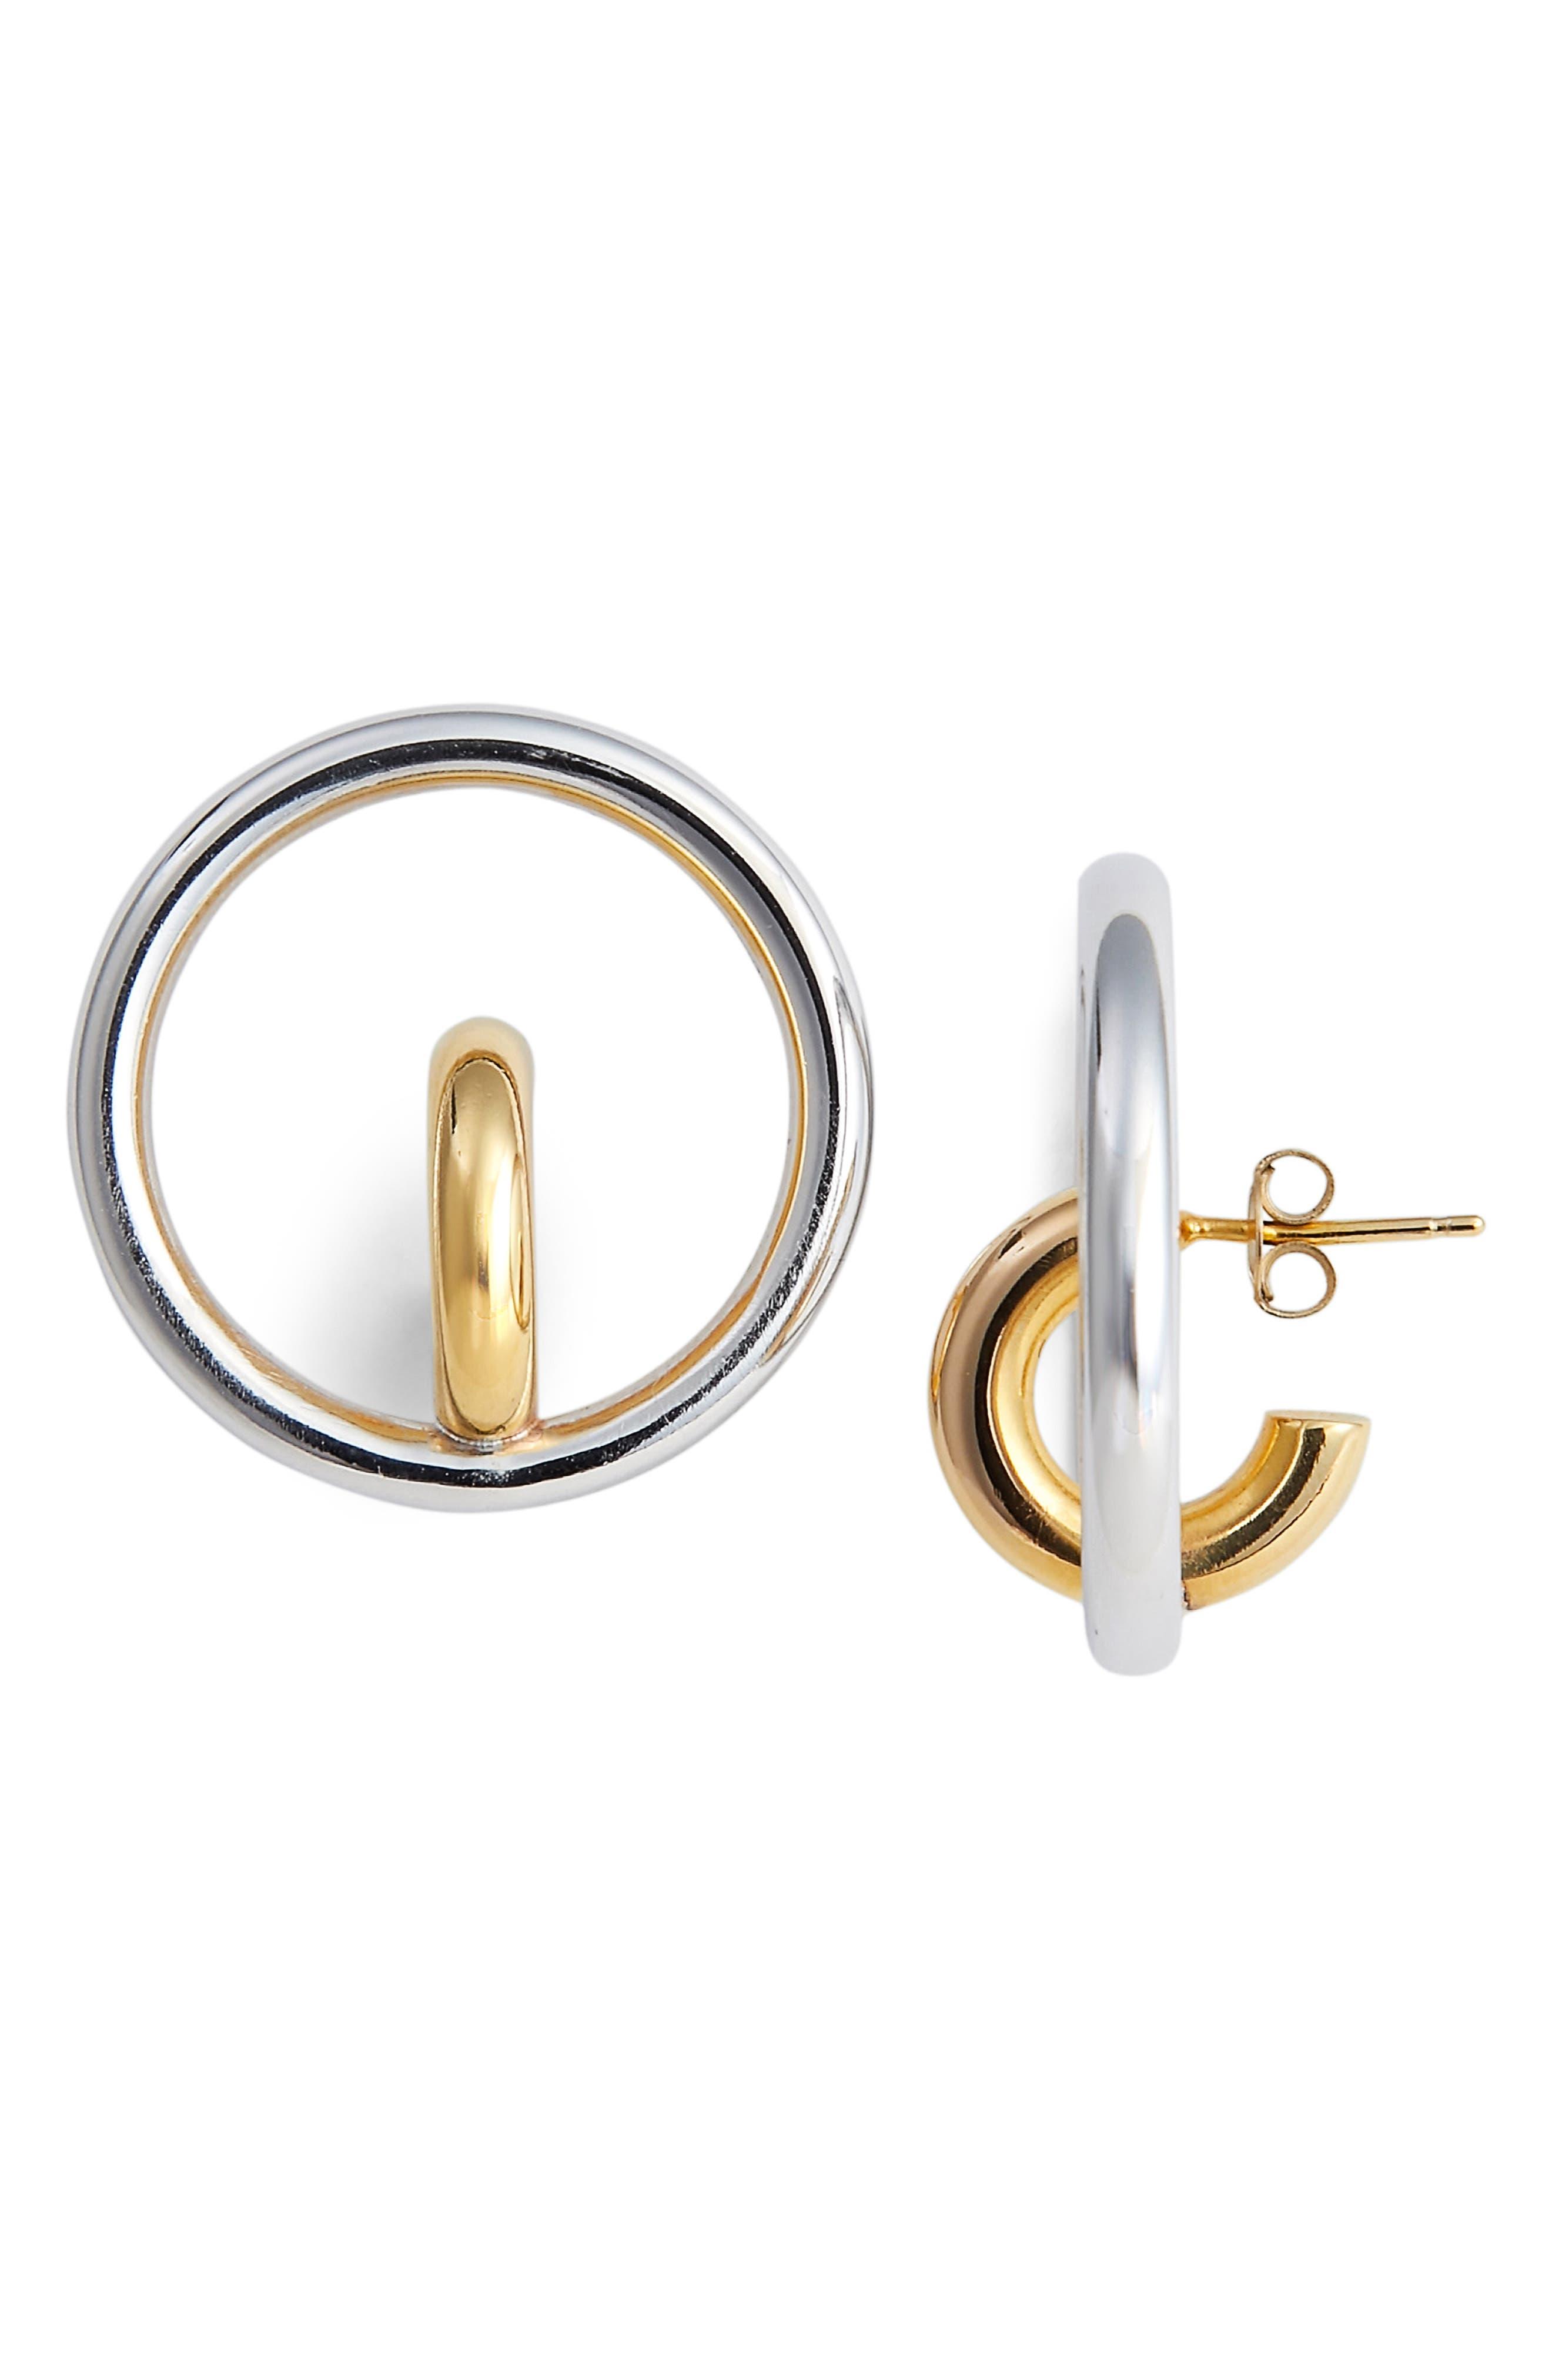 Saturn Blow Medium Hoop Earrings,                         Main,                         color, YELLOW SILVER